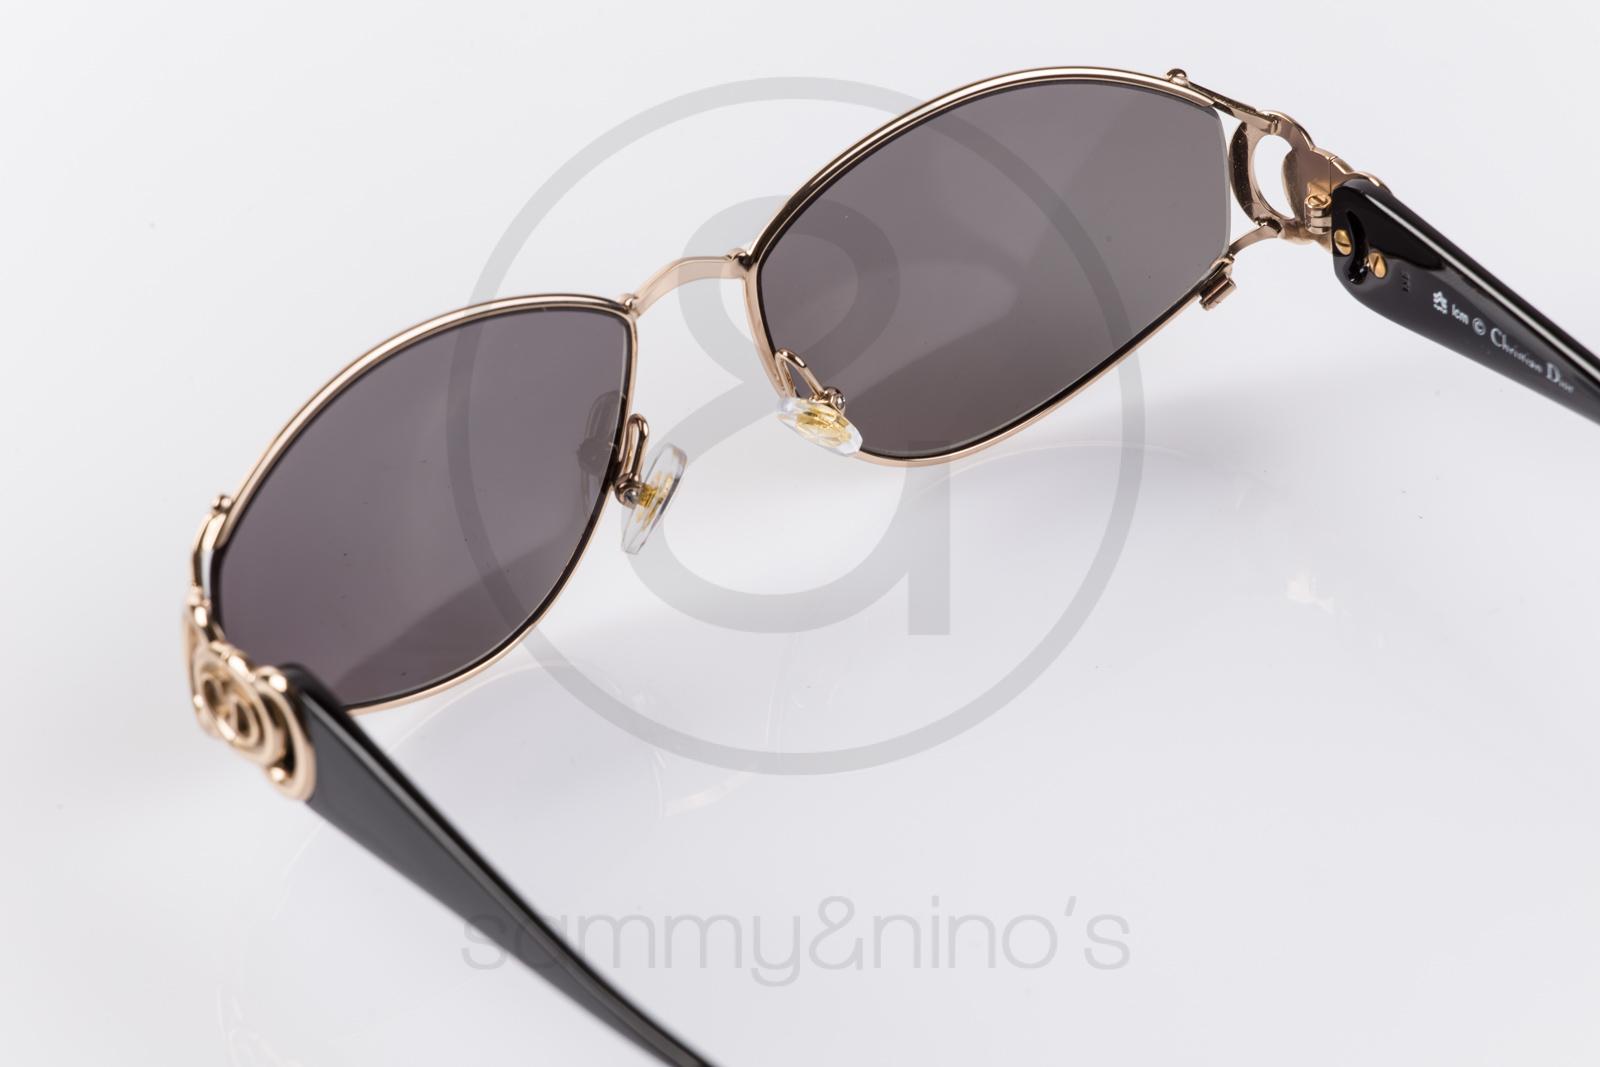 b8f313afccaa0 Vintage Christian Dior Prescription Sunglasses